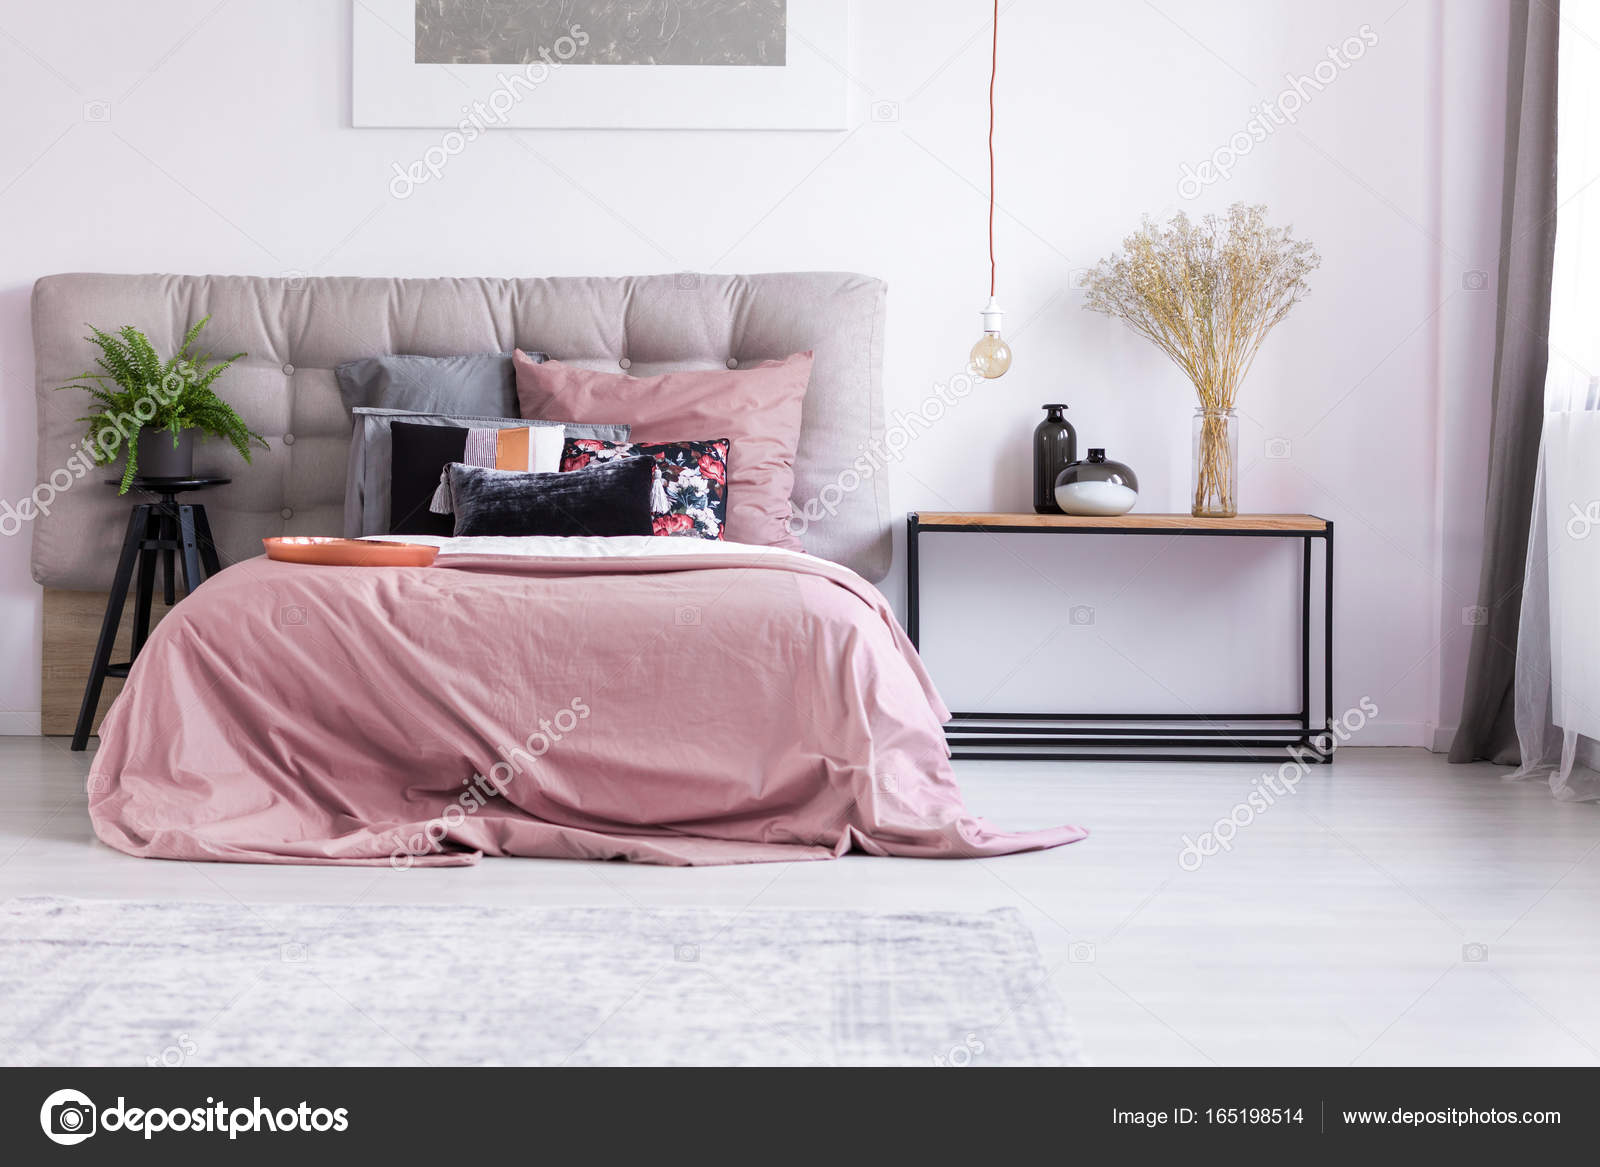 bloemen in glasvaas op tafel en koper gloeilamp in pastel roze slaapkamer met plant op kruk foto van photographeeeu